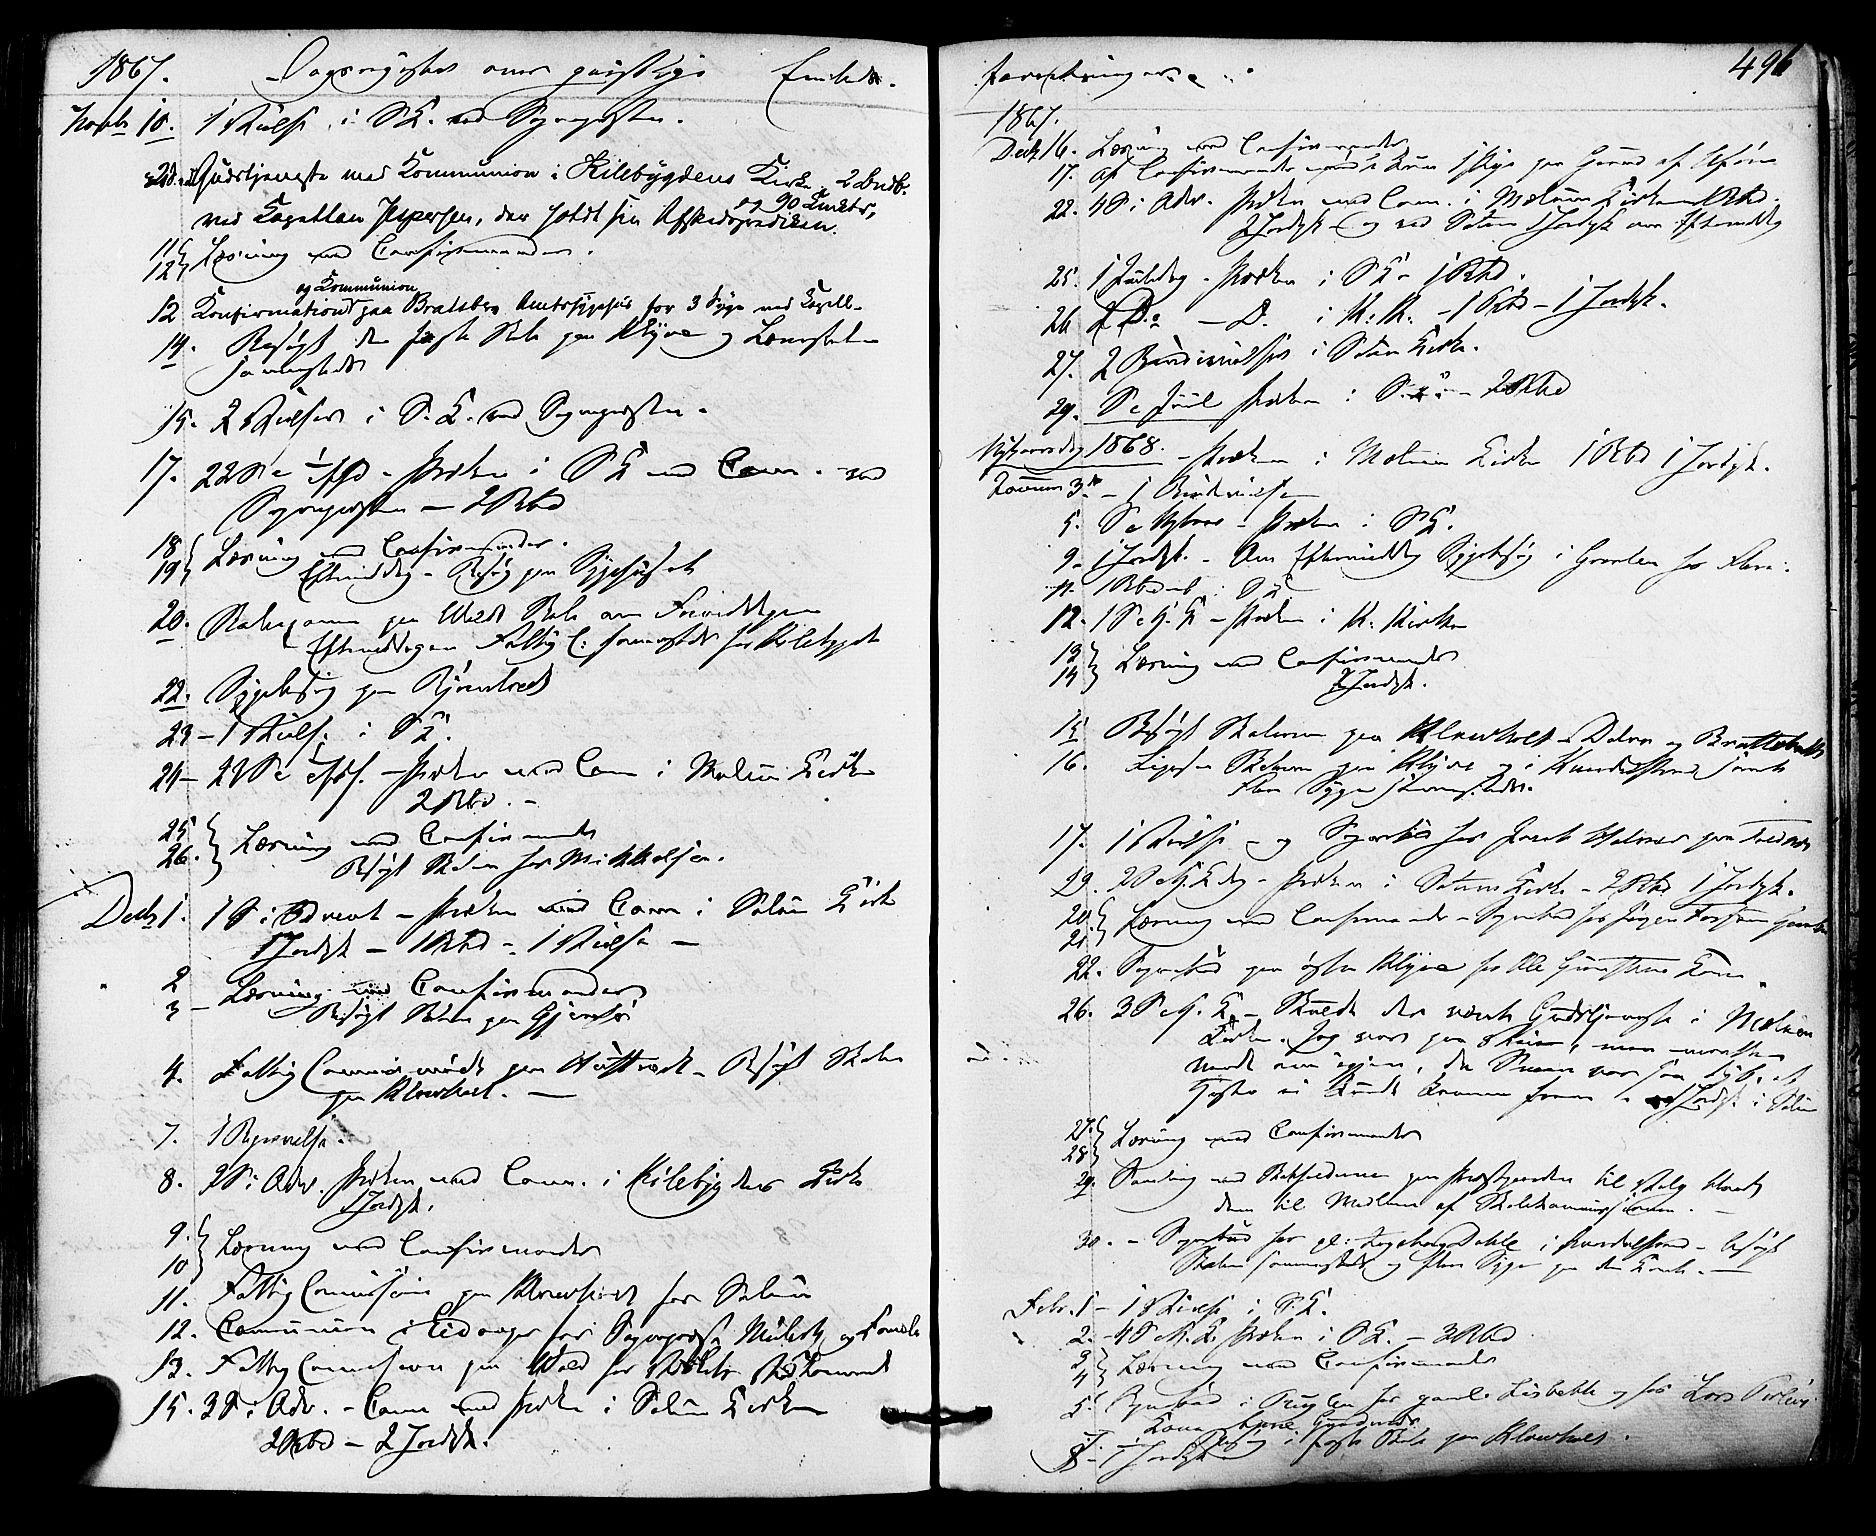 SAKO, Solum kirkebøker, F/Fa/L0008: Ministerialbok nr. I 8, 1865-1876, s. 496